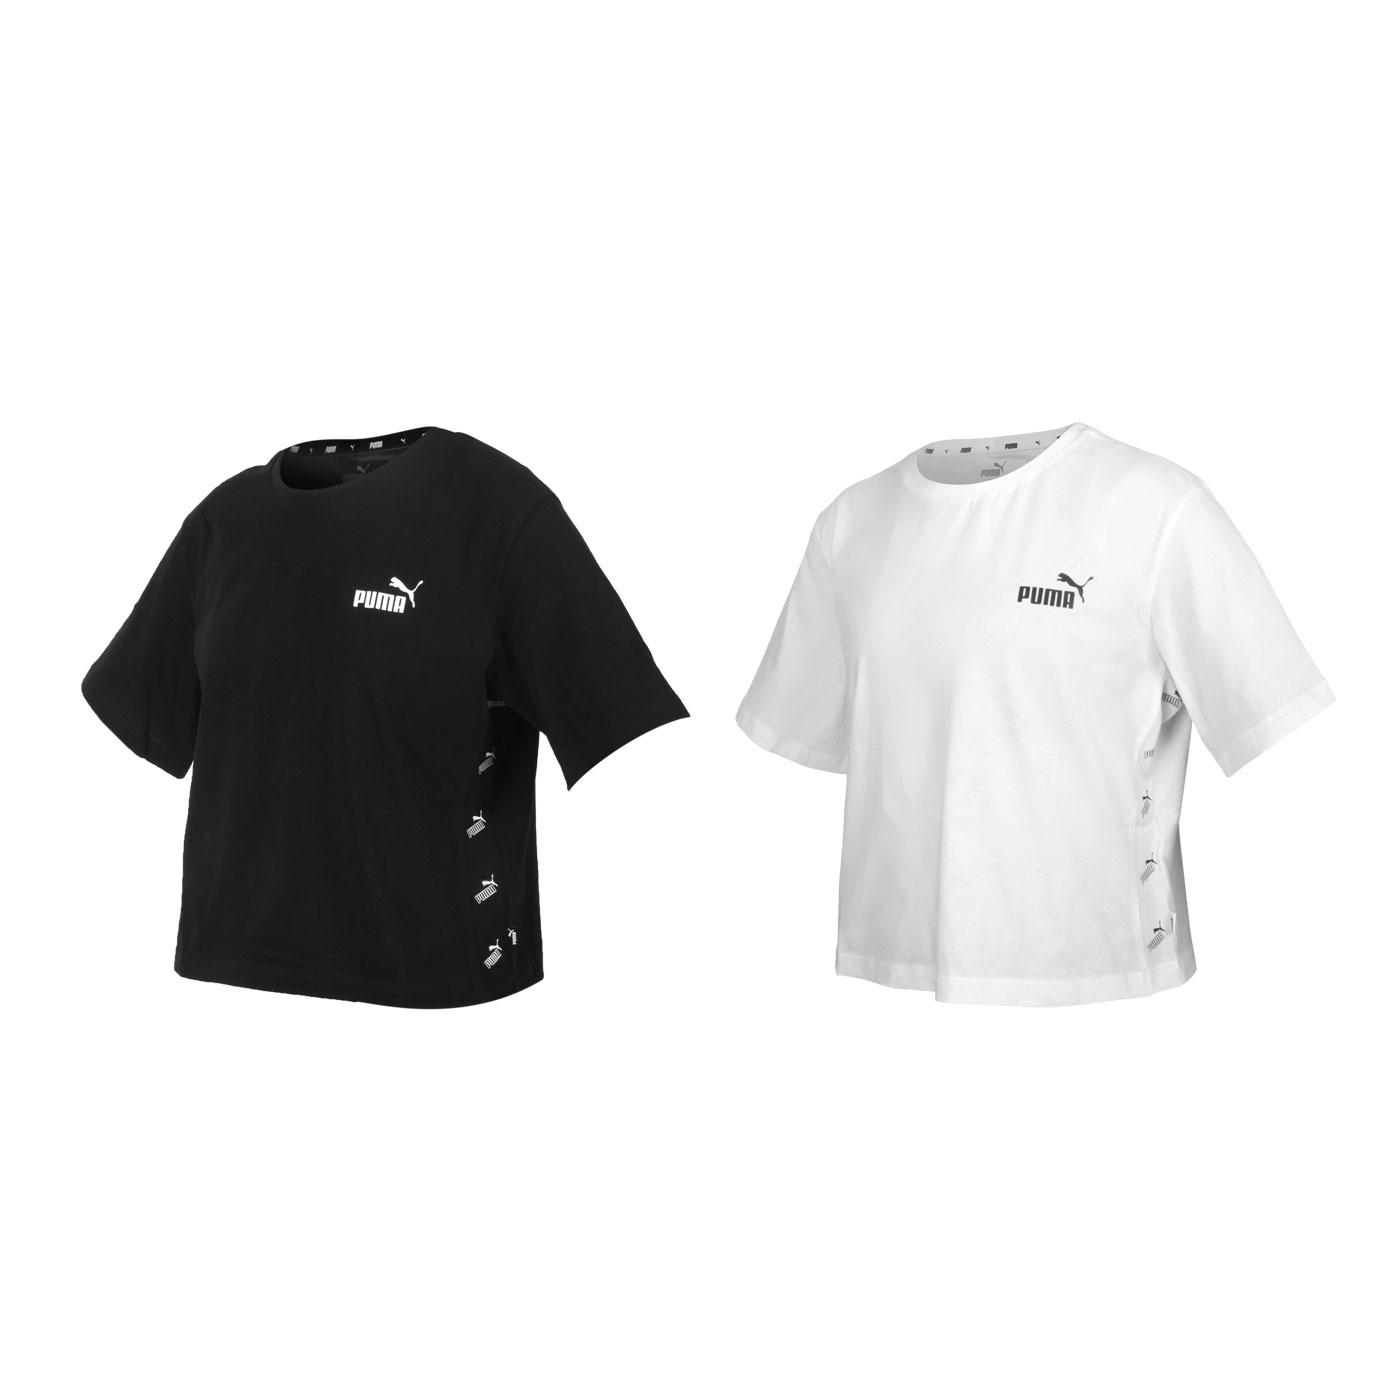 PUMA 女款基本系列短版短袖T恤 58659701